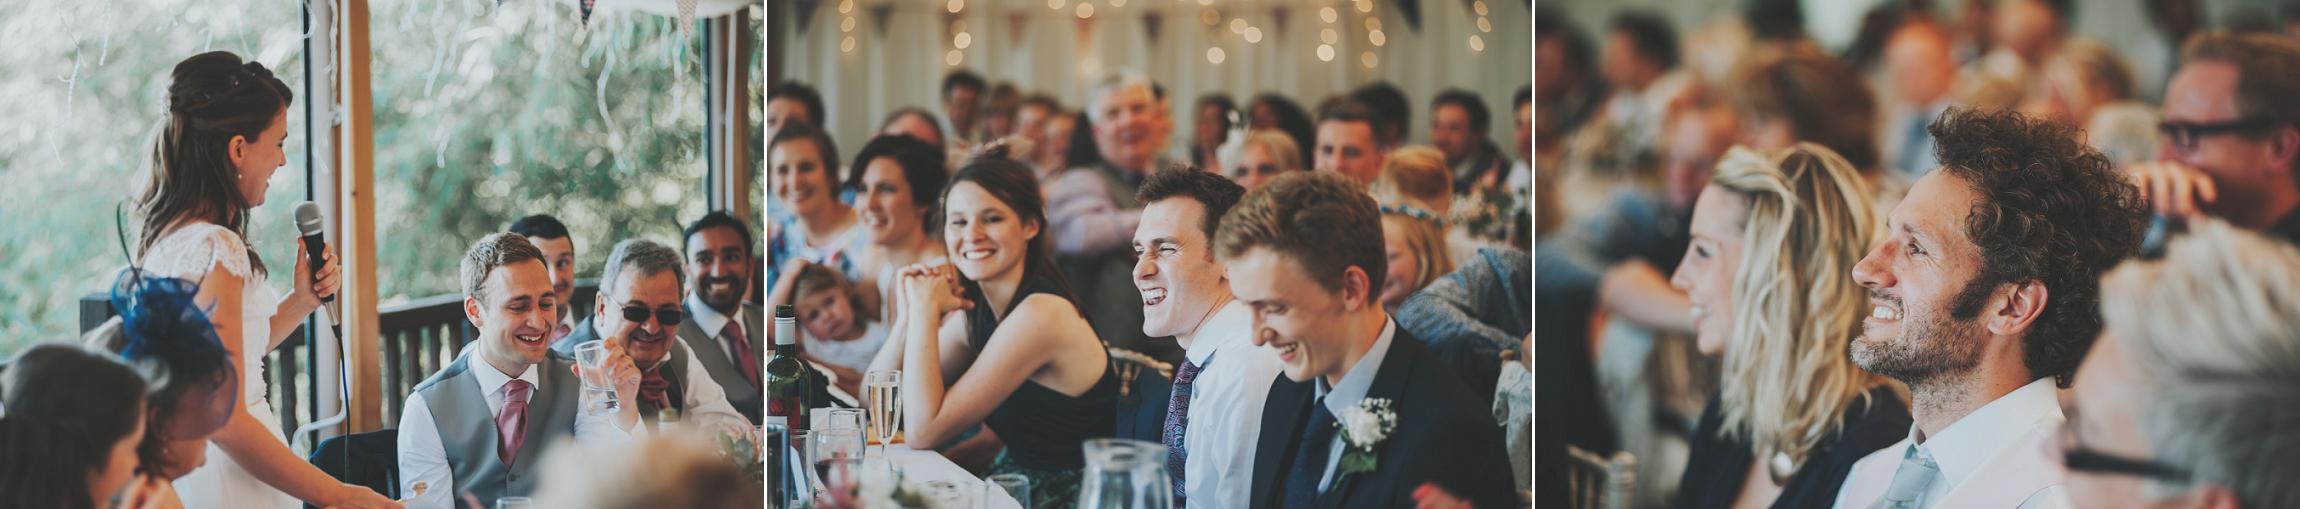 Oxford-Wedding-Photographer_0029.jpg